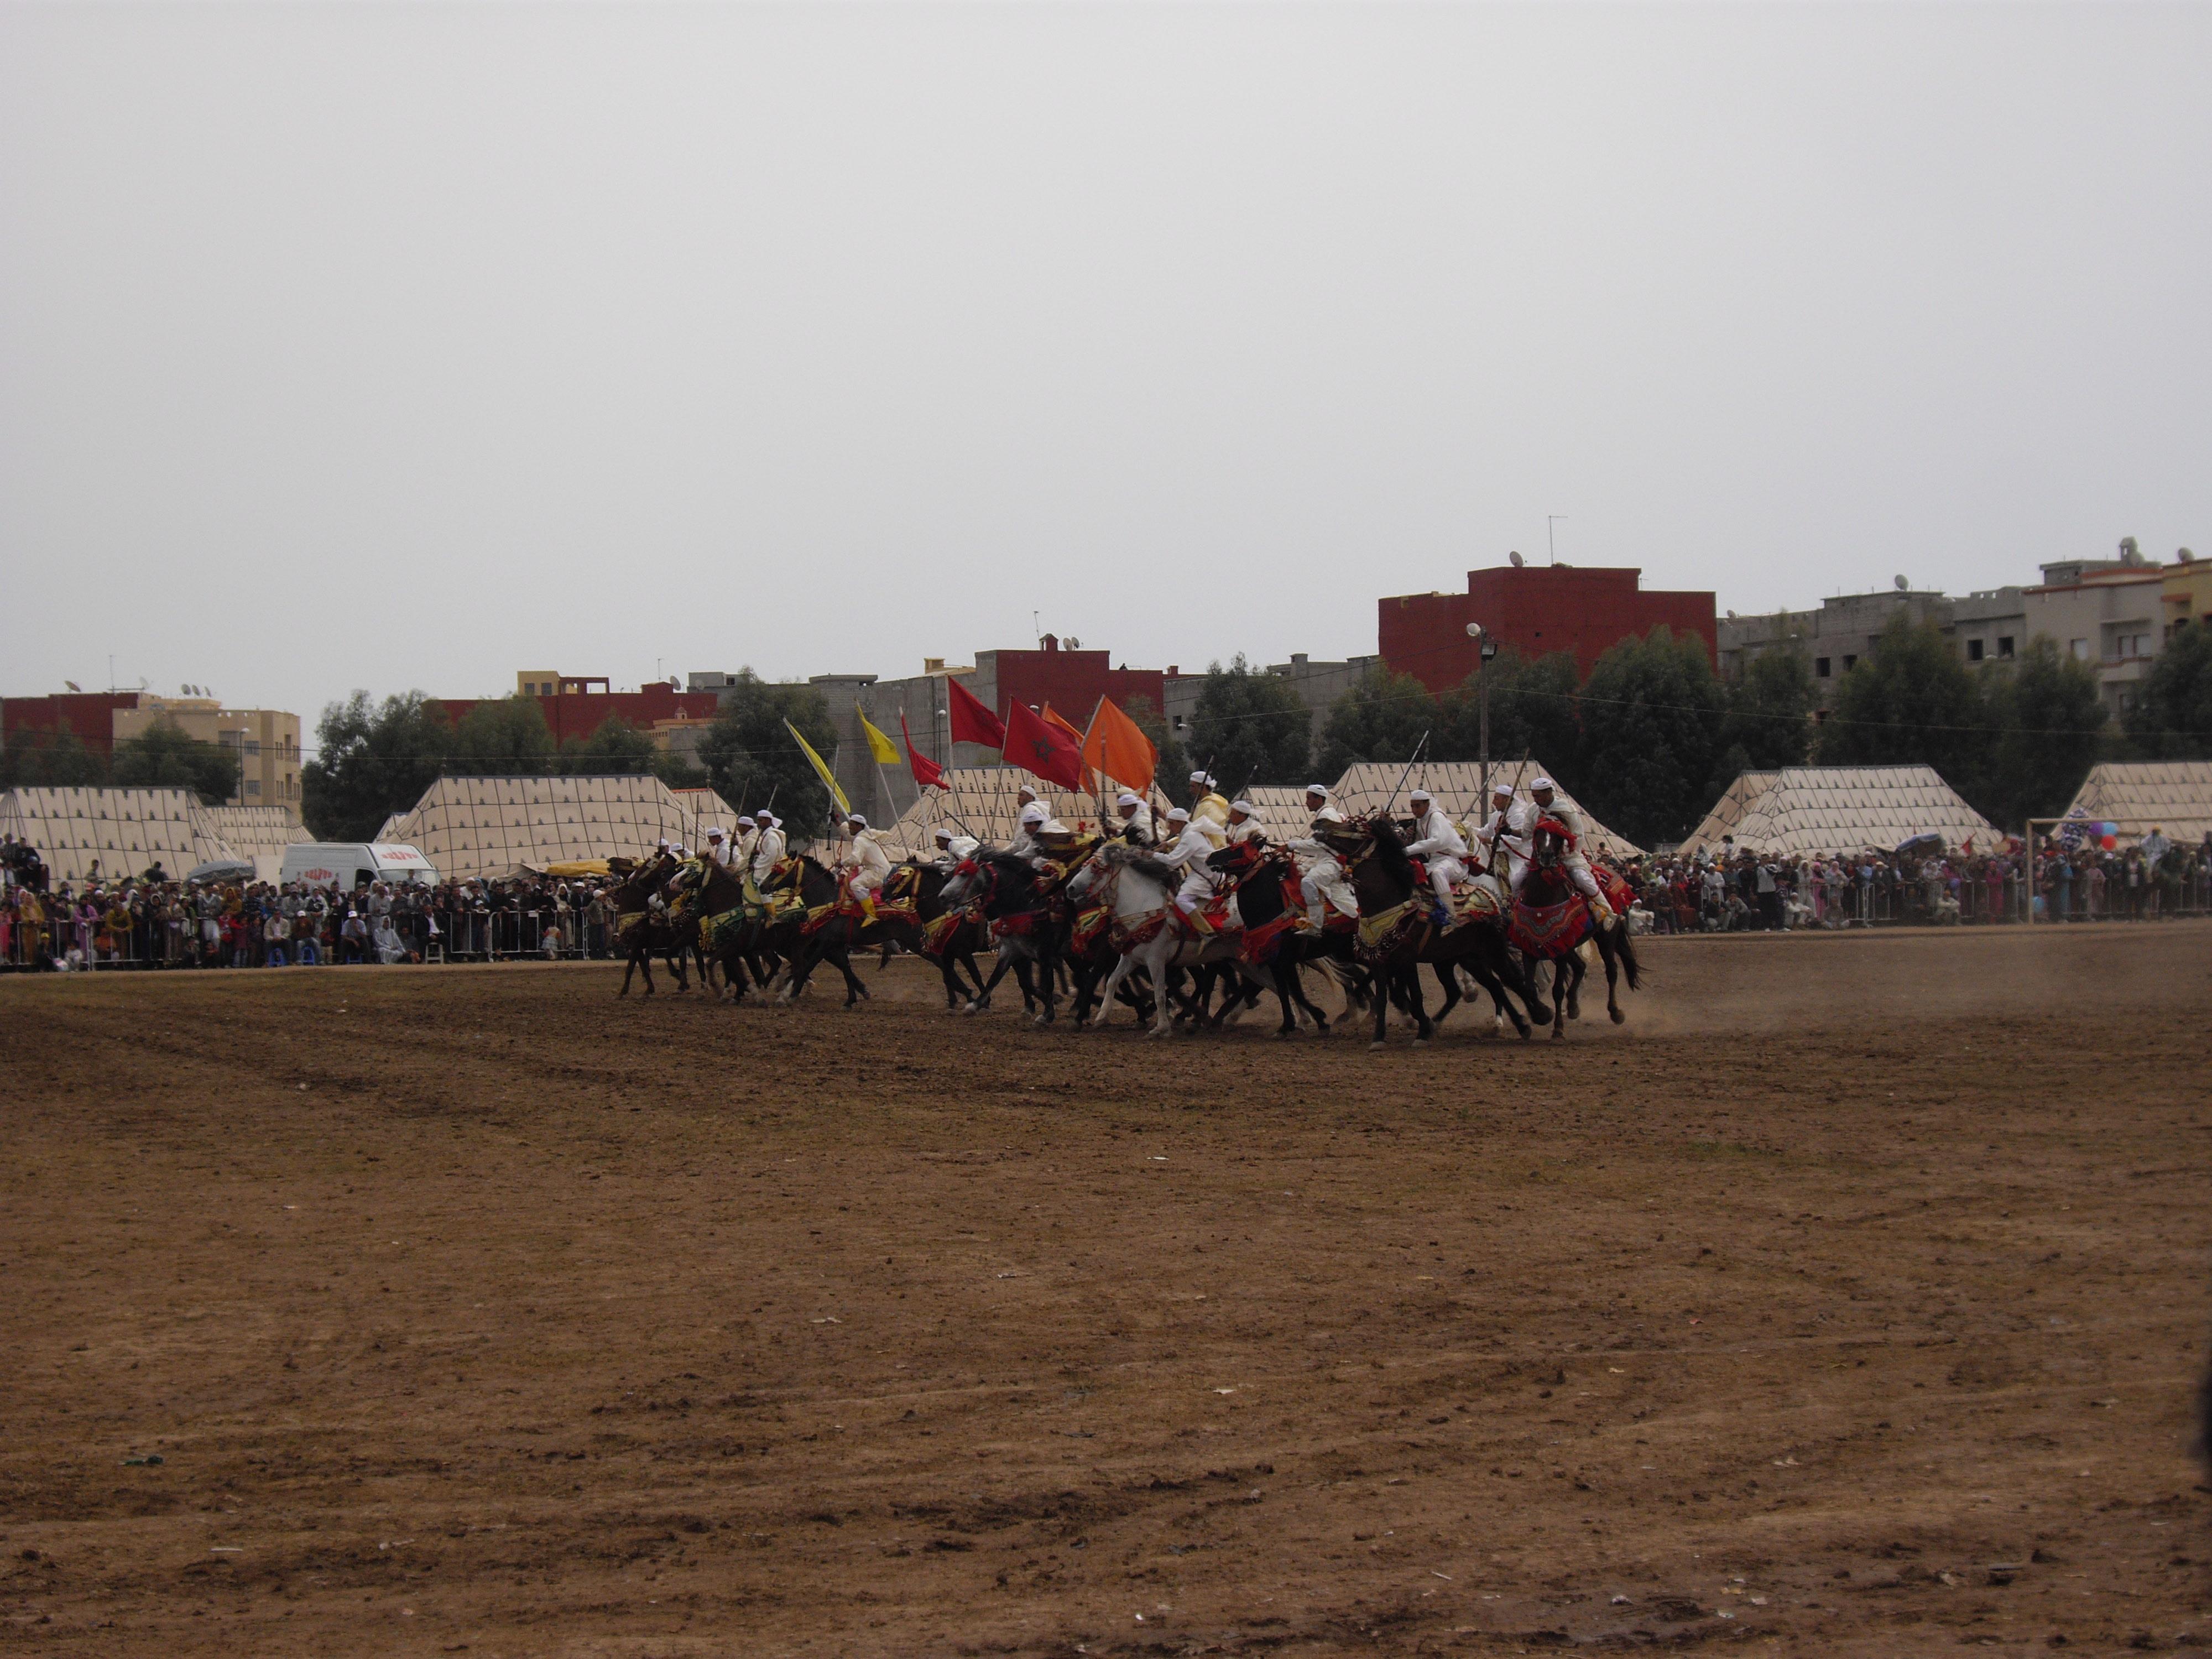 Fantasia - Fqih Ben Salé - Maroc - stage clinic ostéo équine 3